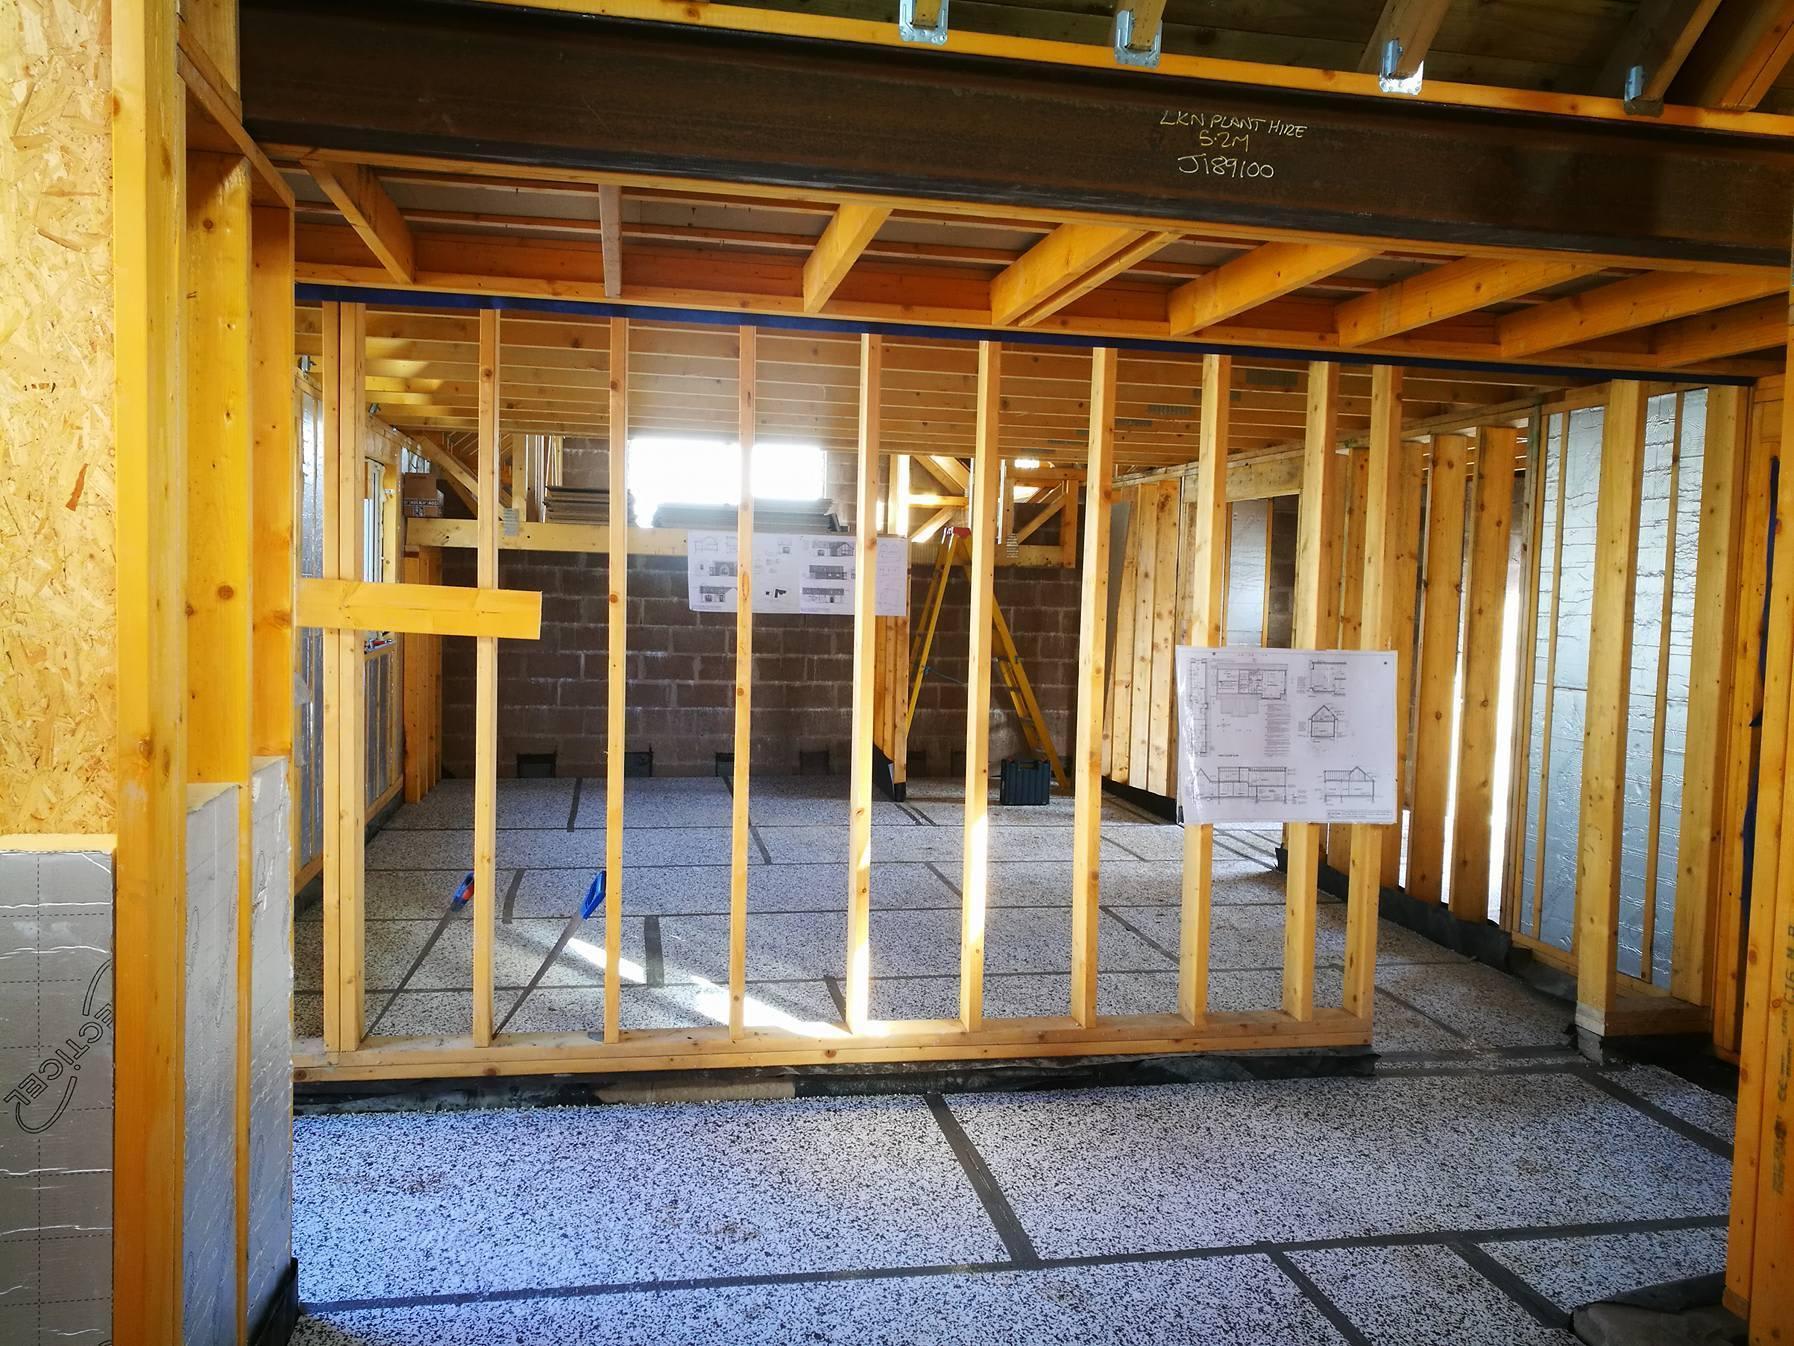 APL Locksmiths & Property Maintenance | 178 Bonnyview Drive, Aberdeen AB16 7EY | +44 7465 205293